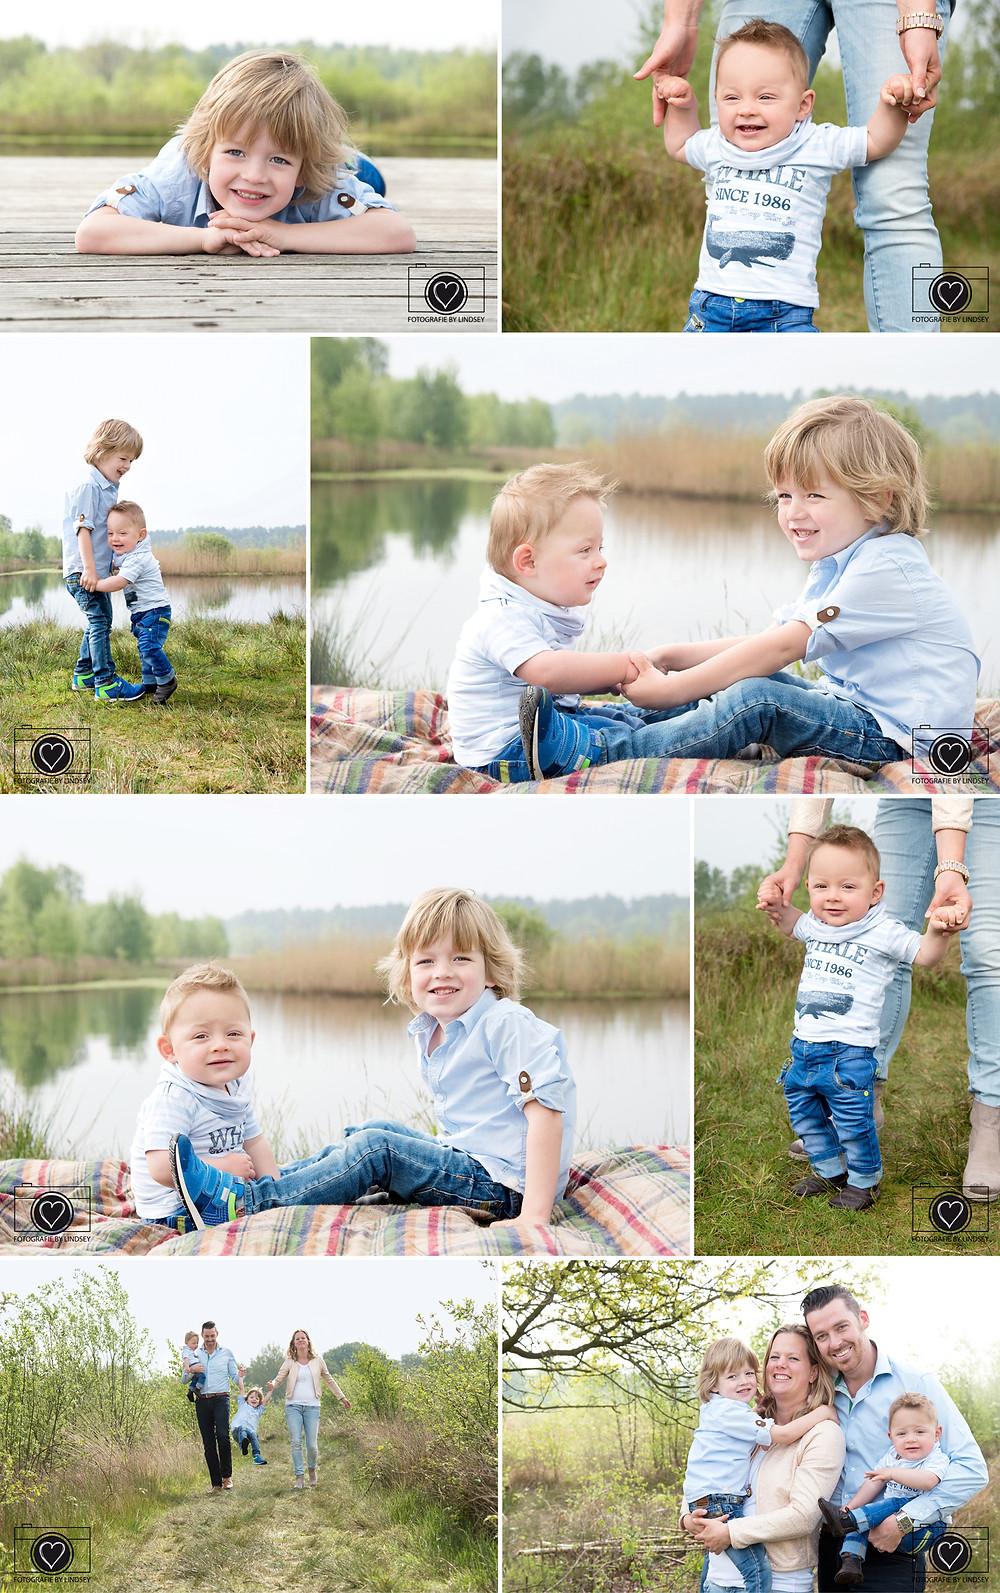 kinderfotografie Hoogerheide Kiddografie.jpg